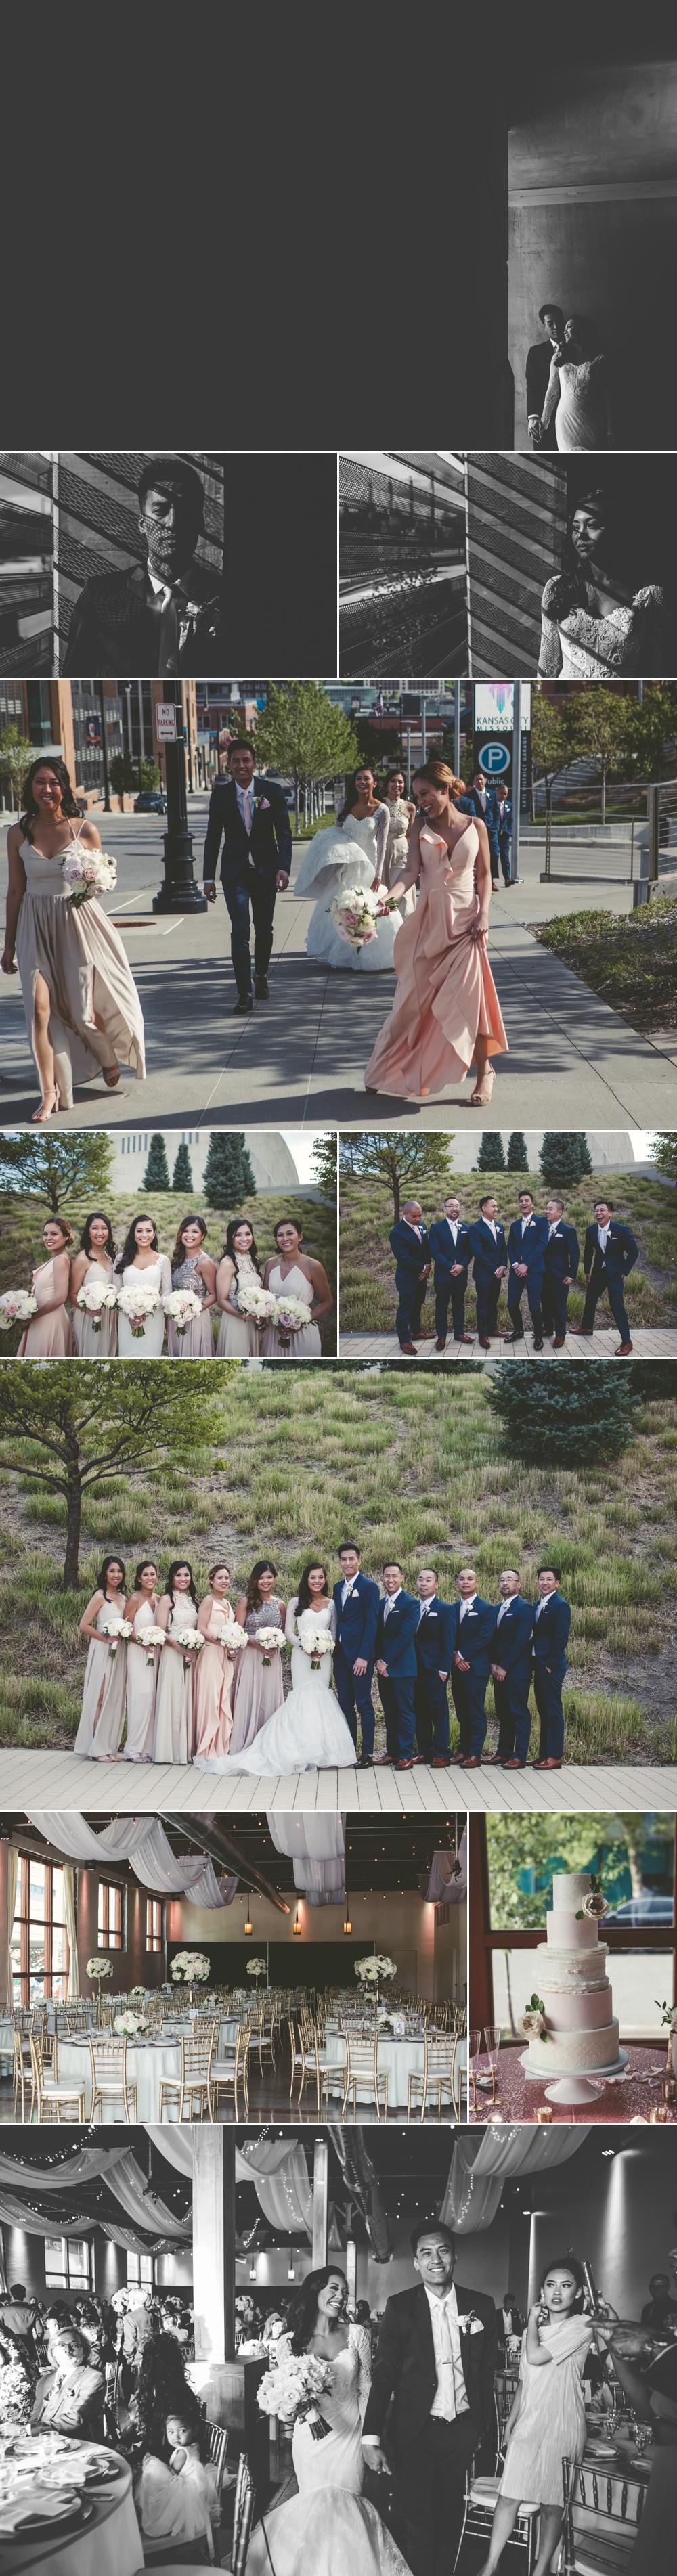 jason_domingues_photography_best_kansas_city_wedding_photographer_kc_weddings_loose_park_monarch_room_0003